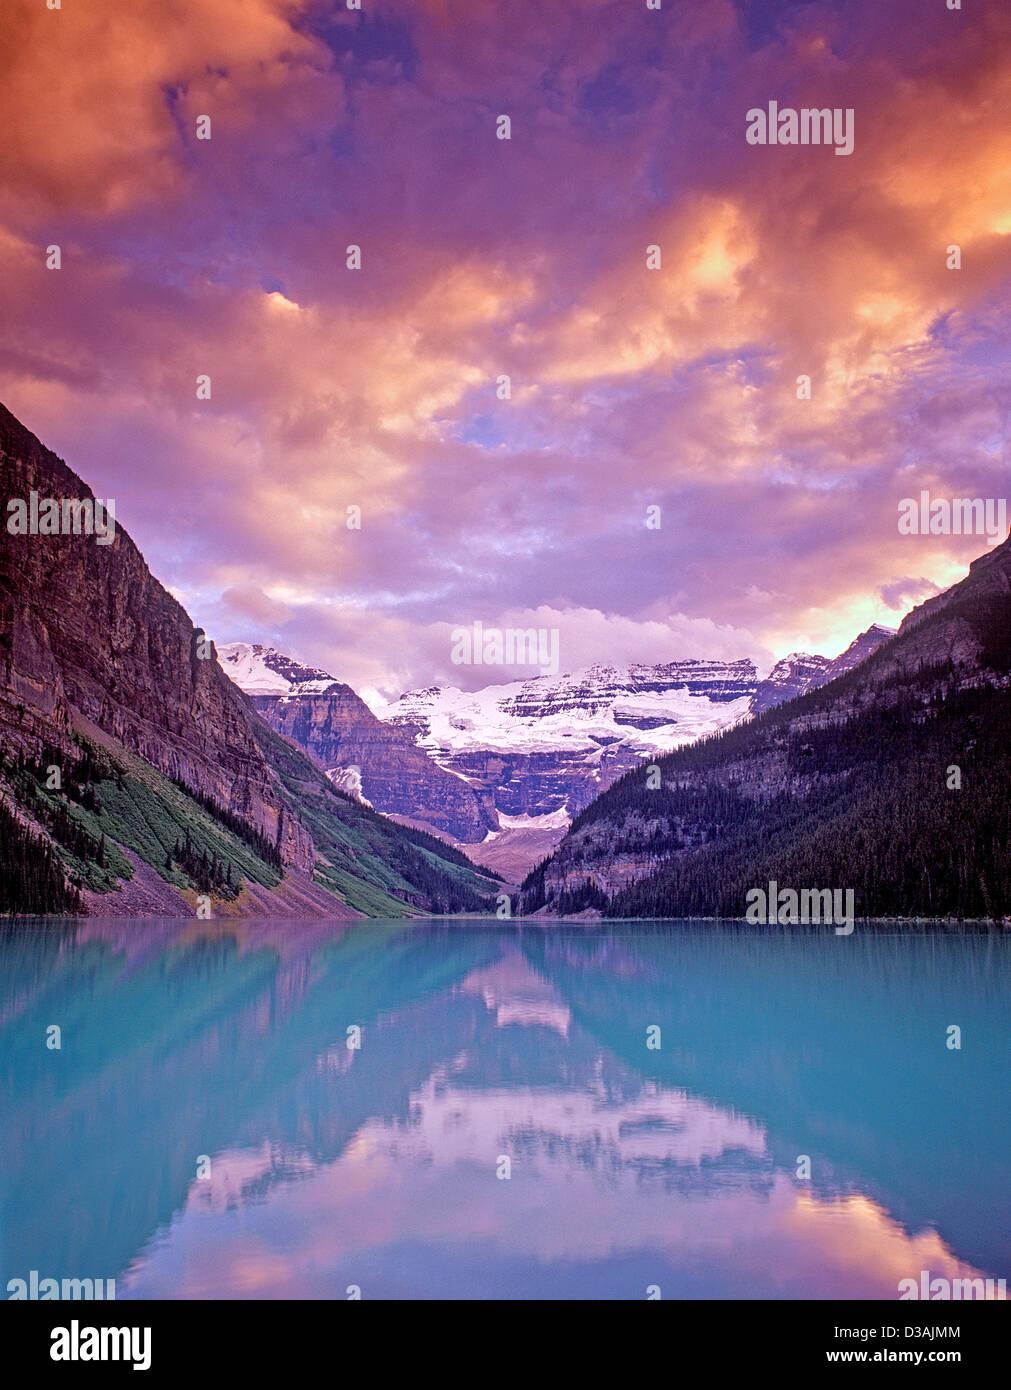 Lake Louise at sunset. Banff National Park, Canada. - Stock Image